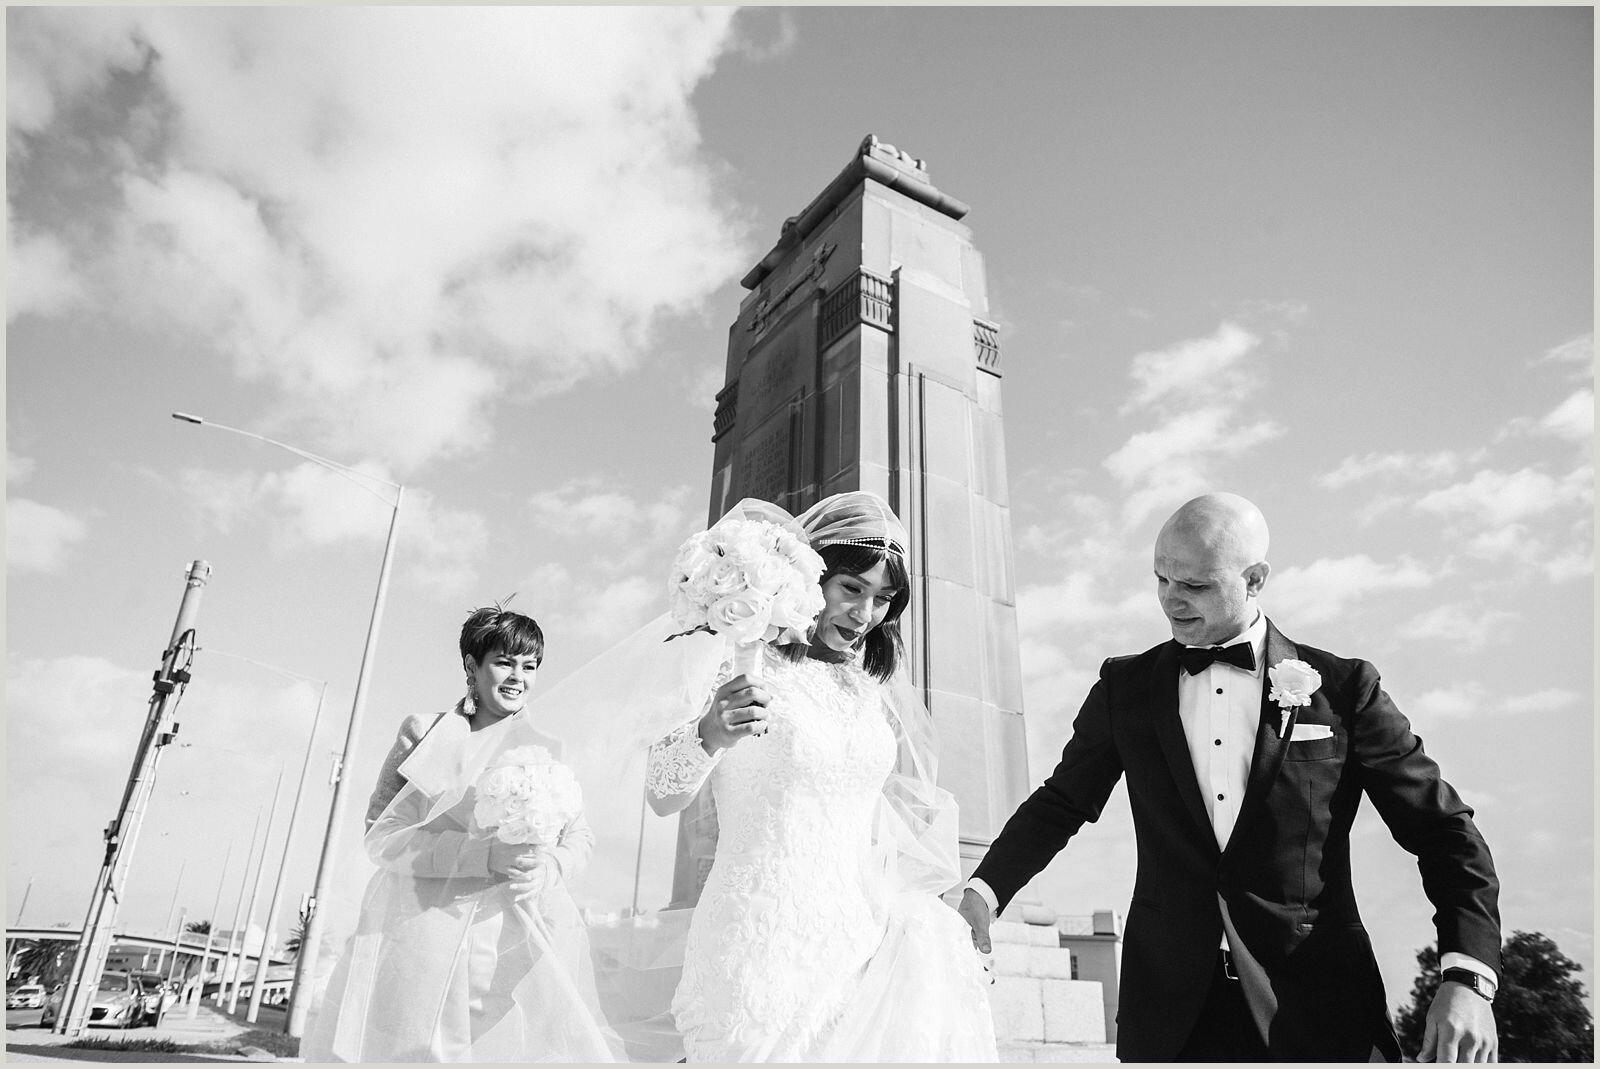 joseph_koprek_wedding_melbourne_the_prince_deck_0025.jpg